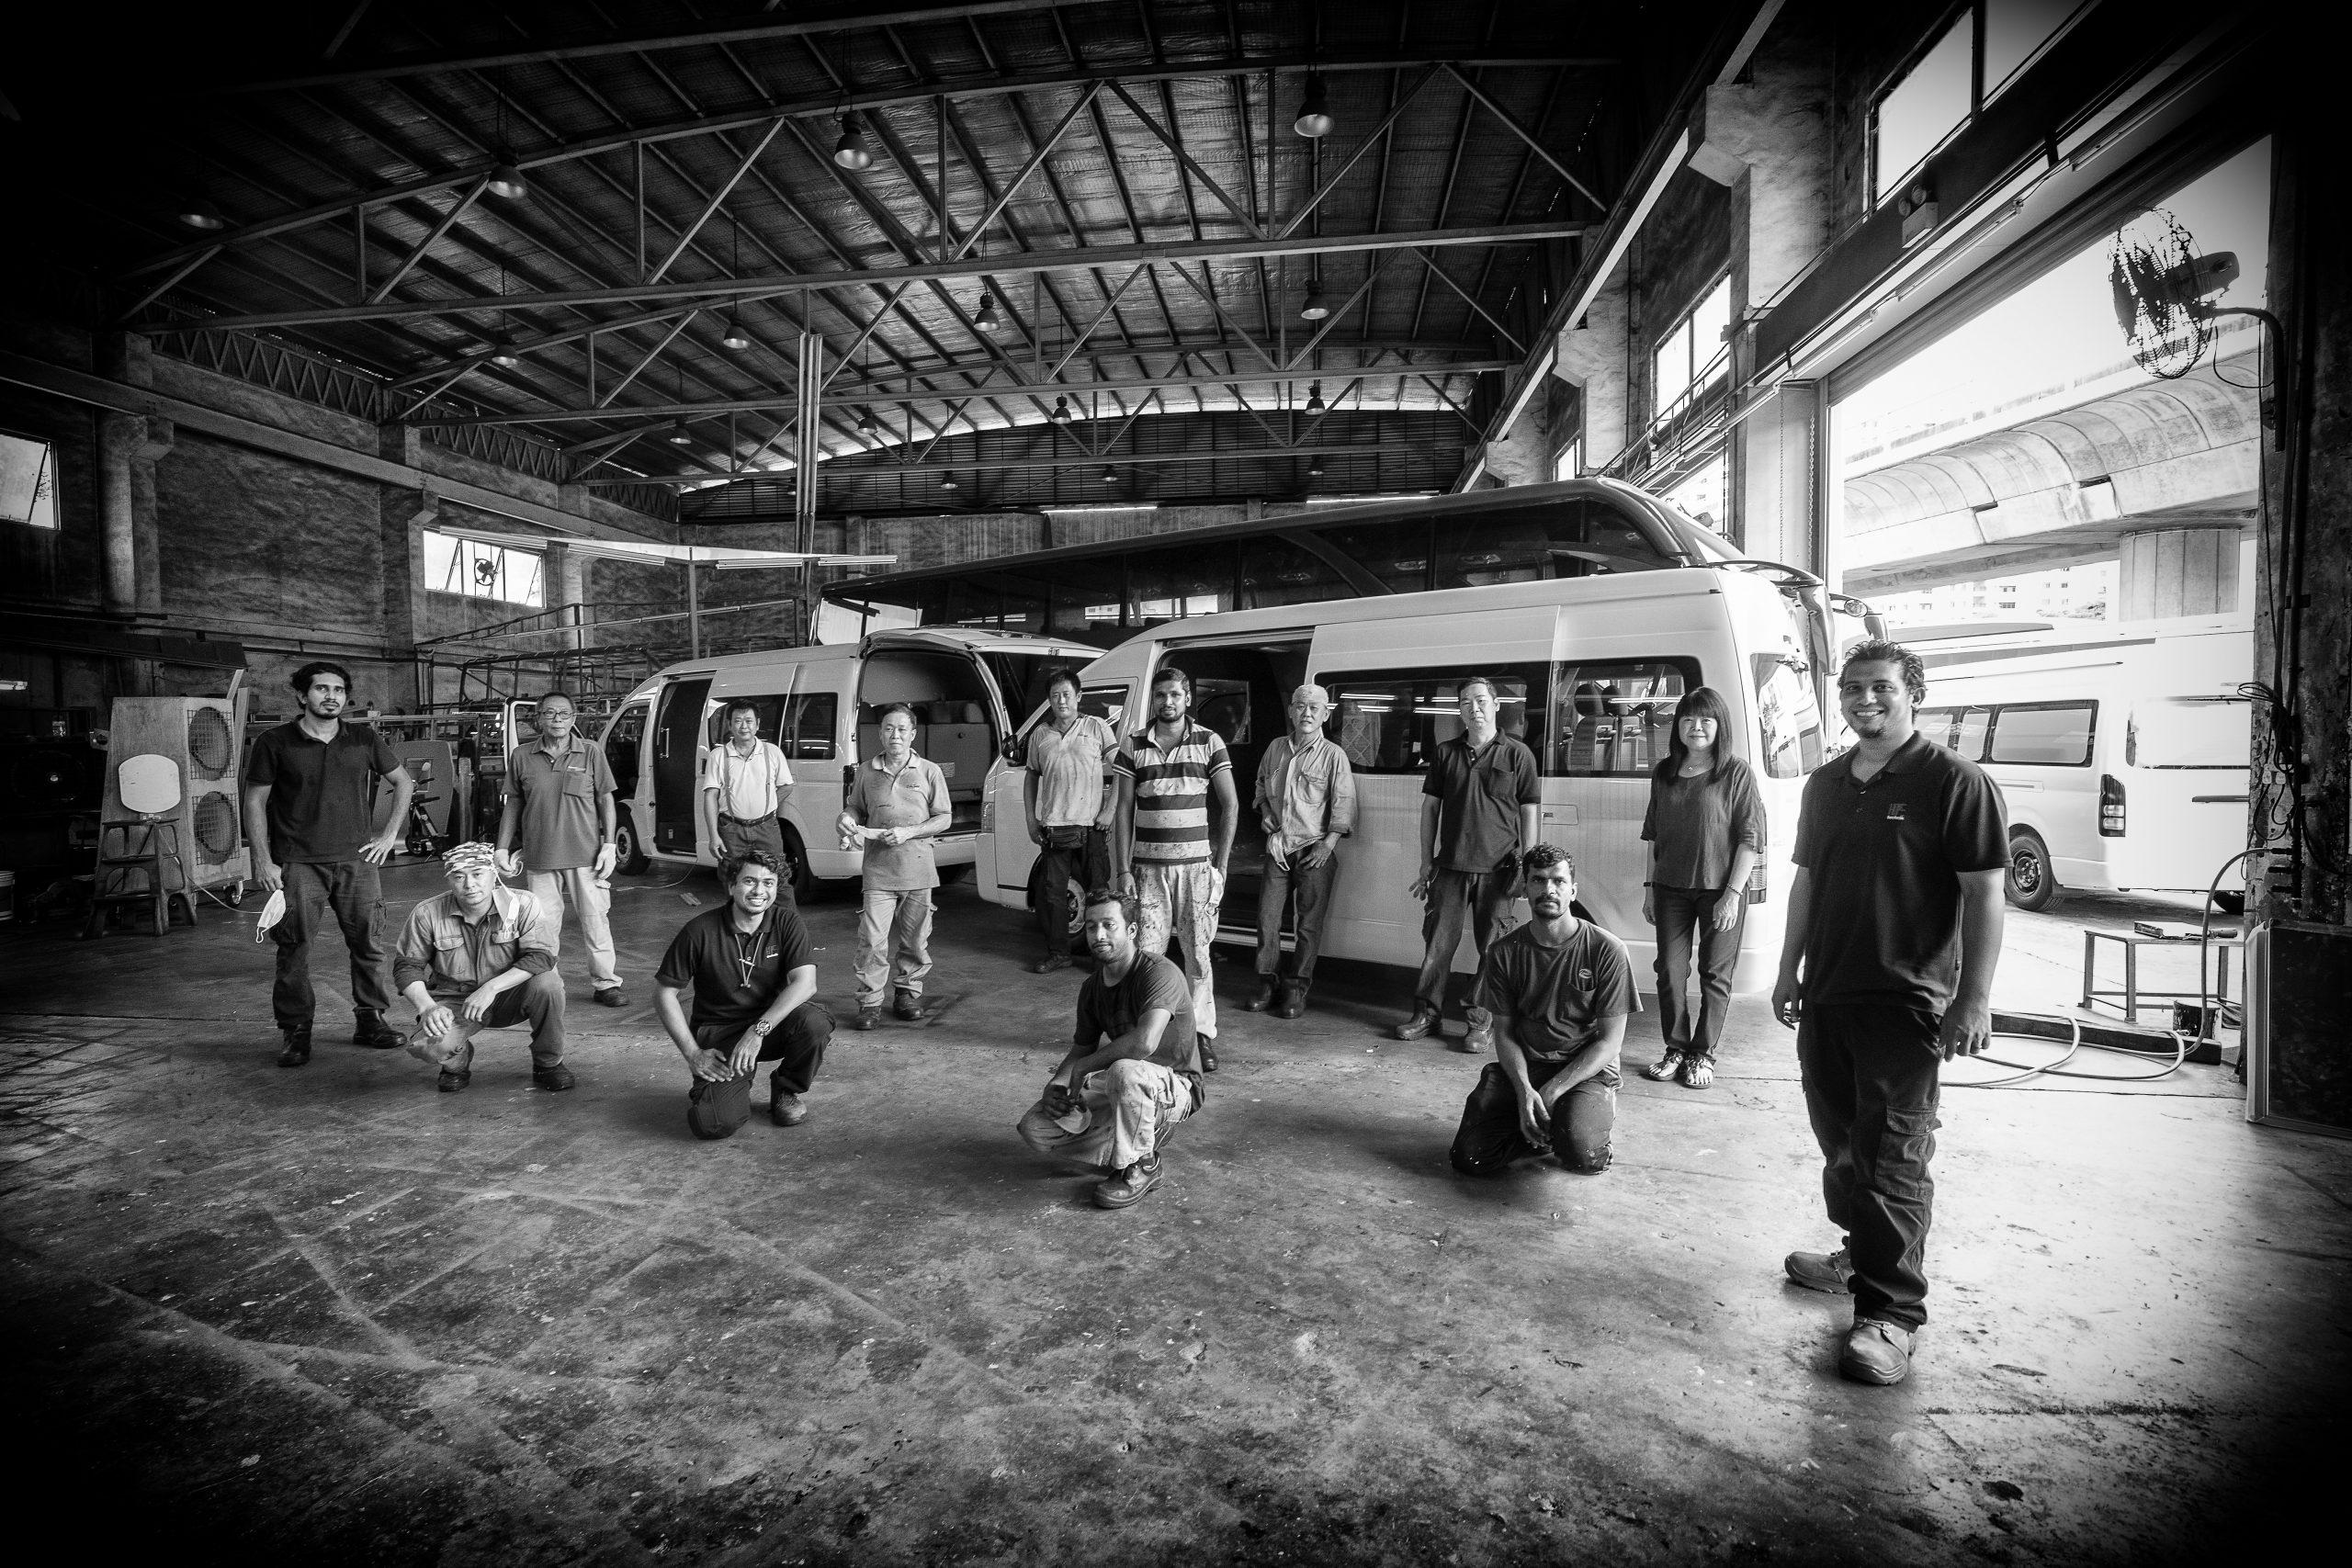 Meet the Aven-gineers: Back row, left to right: Mr Wong Fook Kam, 65, Finishing/Housekeeping from Liannex Corporation; Mr Chan Kong Song, 54, factory manager, Liannex Corp; Mr Chong Siew Yin, 56, Welder, Liannex Corp; Mr Heng Meng Seng, 49, air-conditioner installer, Cool-Air Technology; Mr Kariyaiyan Rajesh Kumar, 34, panelling, Liannex Corp; Mr Tan Kian Keong, 53, welder, Liannex Corp; Mr Yeh Kooi San, 47, mechanic, Liannex Corp; Ms Ellice Ng, 58, sales manager, Liannex Corp. Front (L-R): Mr Mulleri Jithin, 26, electrical technician, Liannex Corp; Mr Han Tian Wei, 40, mechanic, Liannex Corp; Mr Vicneswaran Naidu, 35, head of TRIGEN Automotive, HOPE Technik; Mr Kariyaiyan Rajesh Kumar, 34, panelling, Liannex Corp; Mr Muruganandham Samiayya, 33, panelling, Liannex Corp; Mr Kuzhanthaivel Prabu, 40, panelling, Liannex Corp; Mr Vinoth Pannirsilvam, 32, lead engineer of TRIGEN Automotive, HOPE Technik.